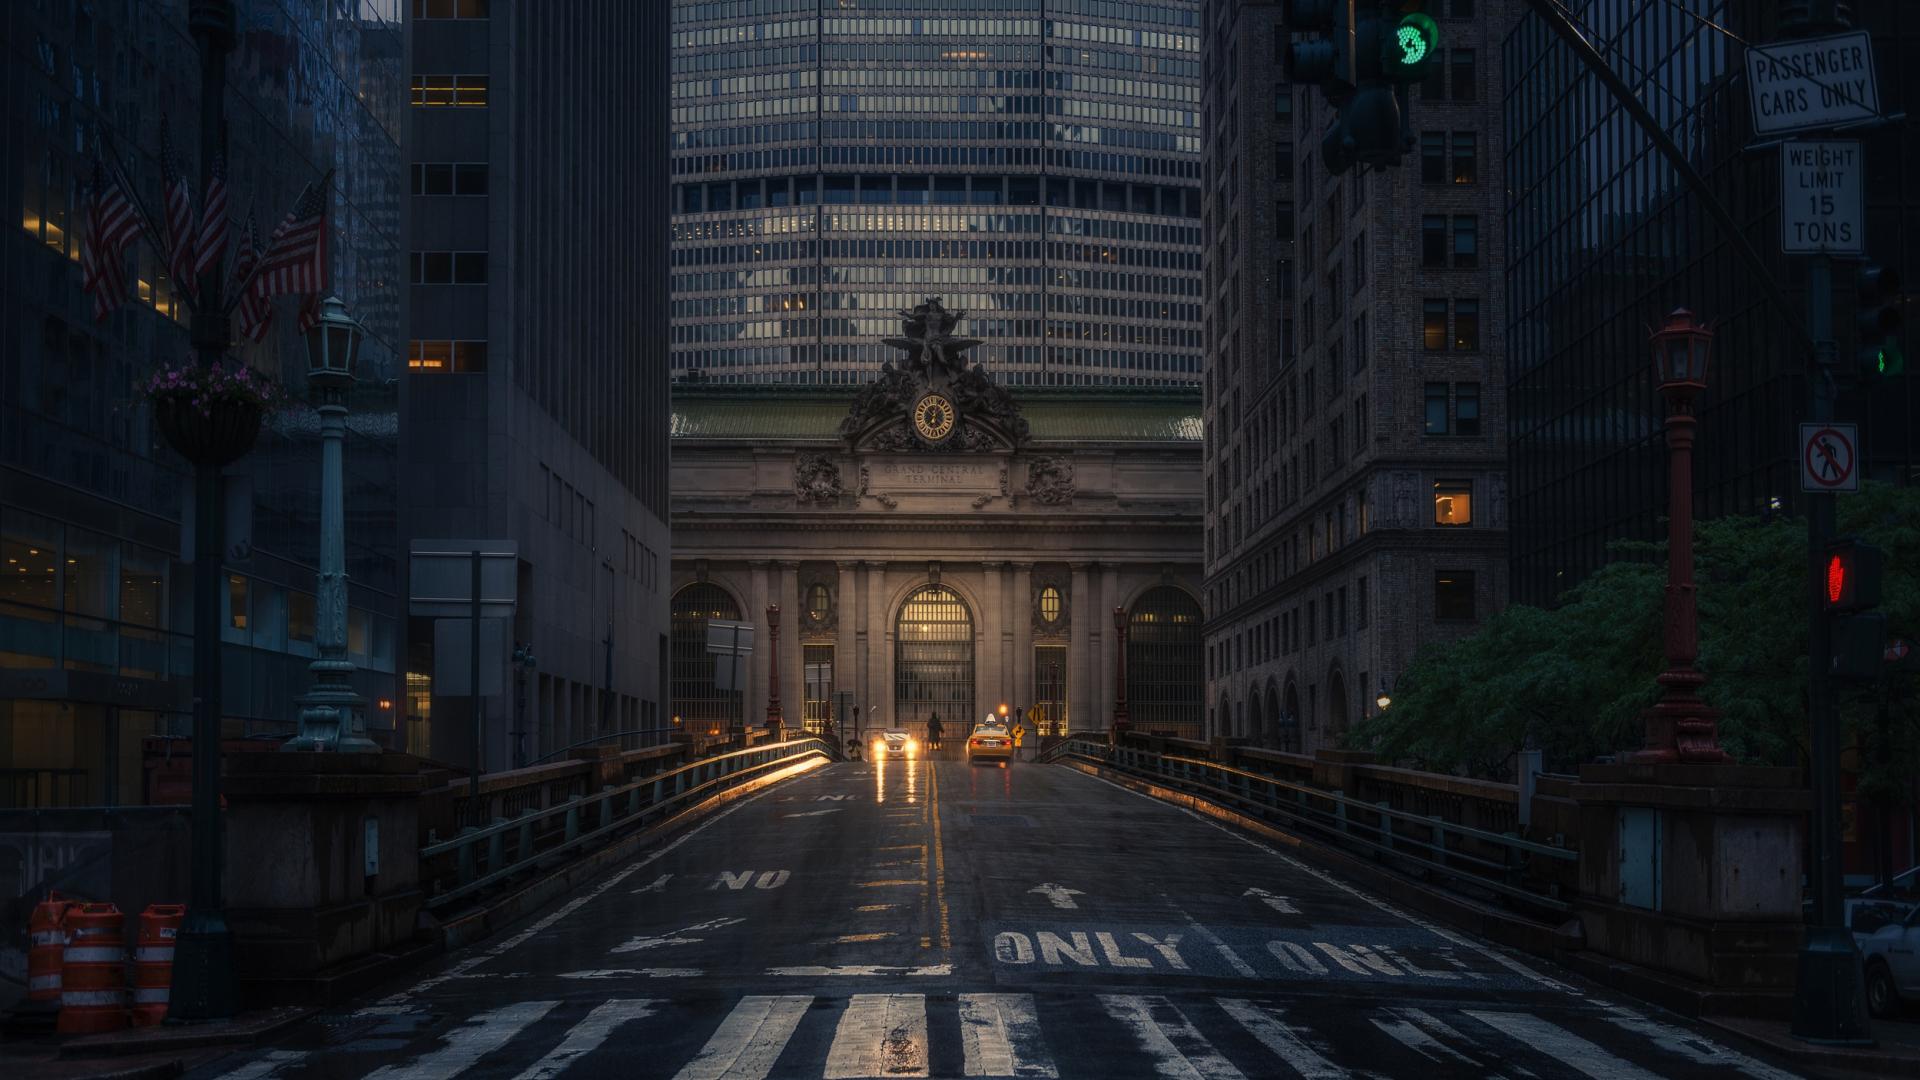 1920x1080 Wallpaper Road New York Night City